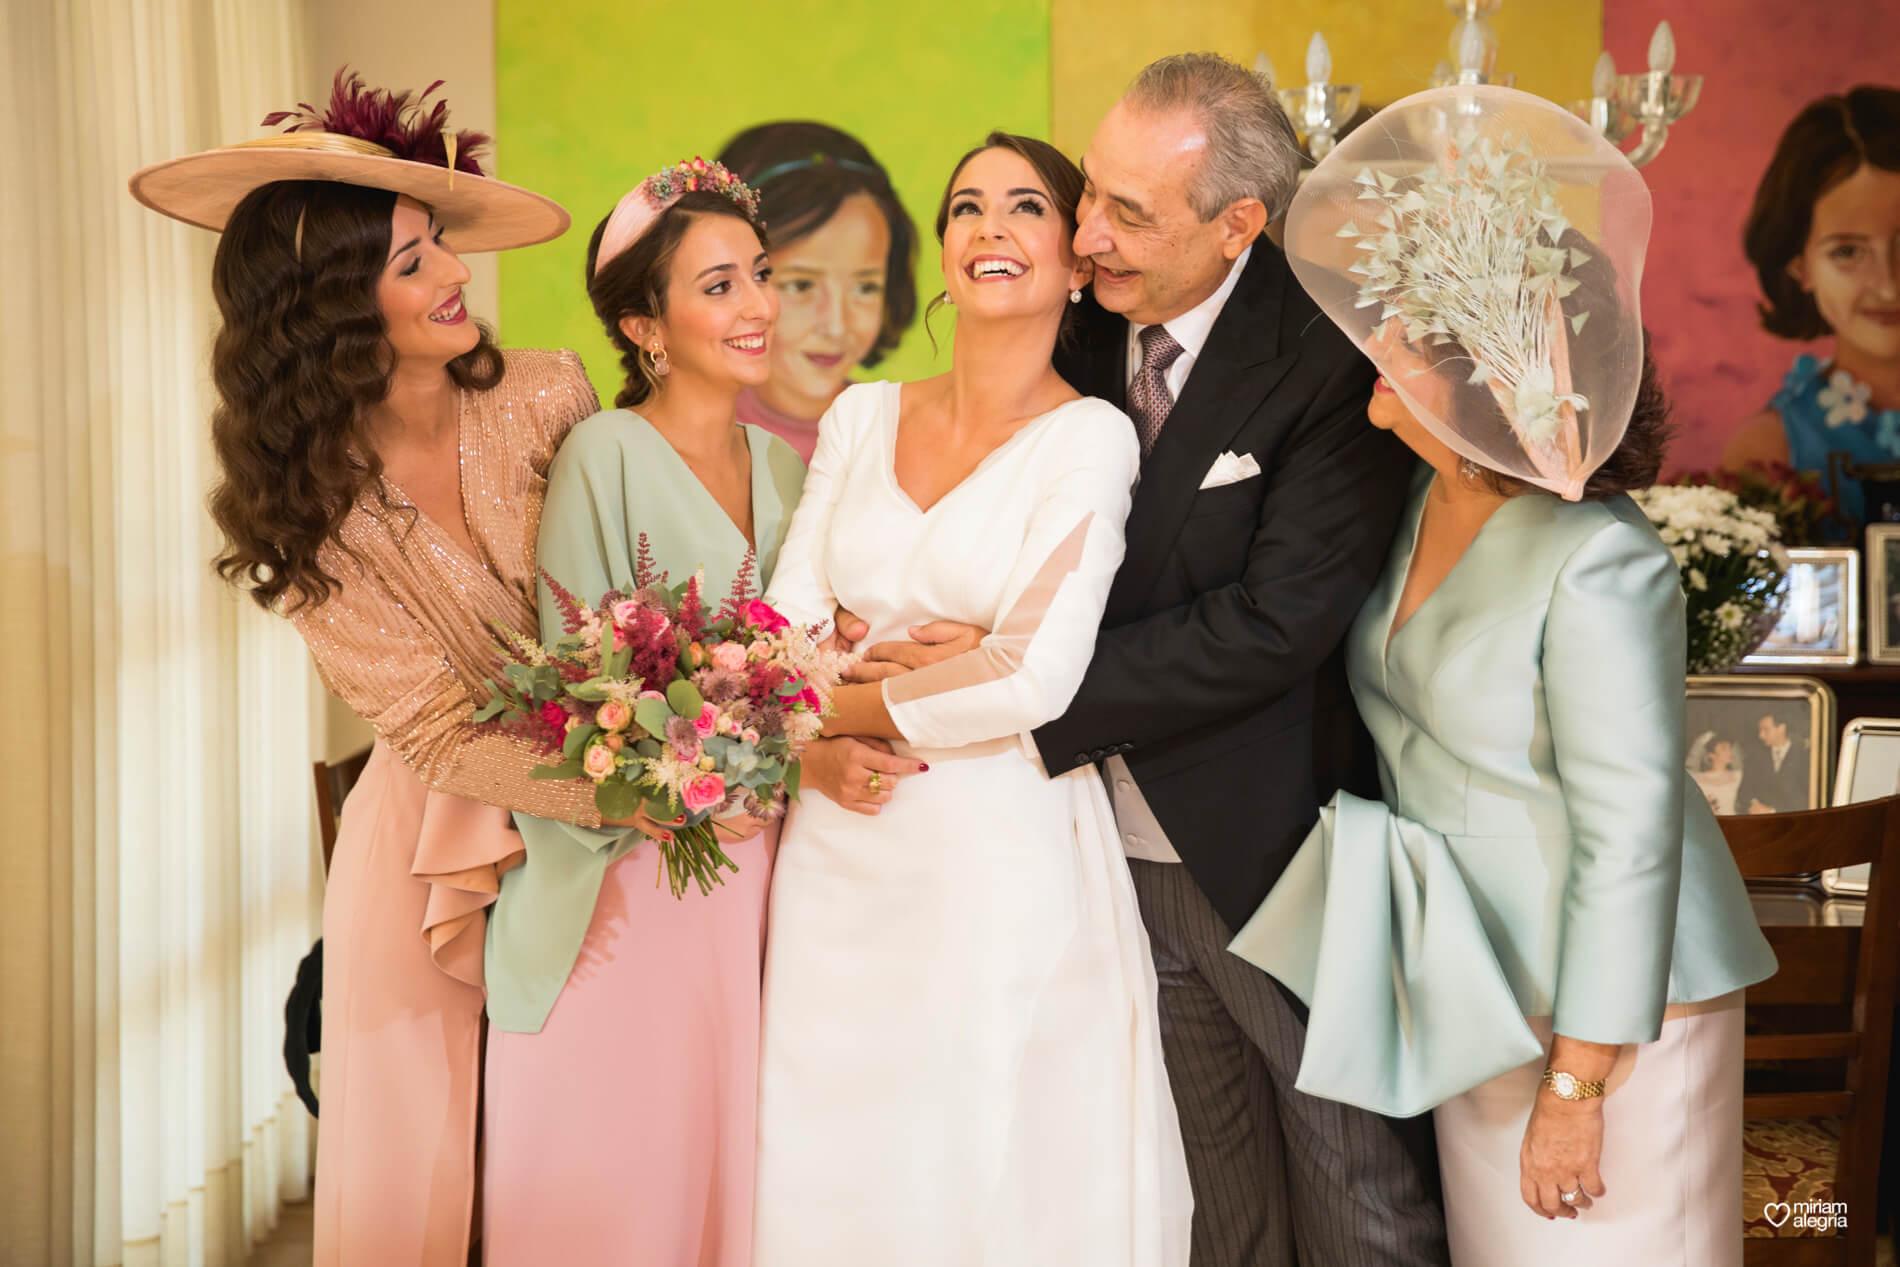 vestido-de-novia-paula-del-vas-miriam-alegria-fotografos-boda-murcia-37